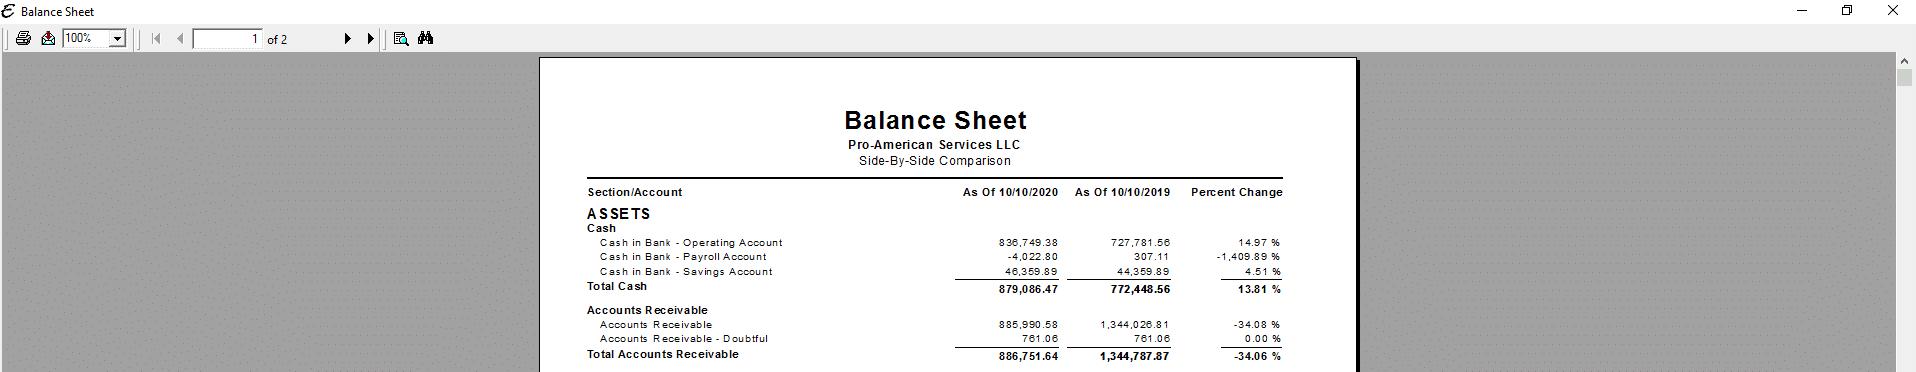 Balance Sheet - Percent Comparison PDF